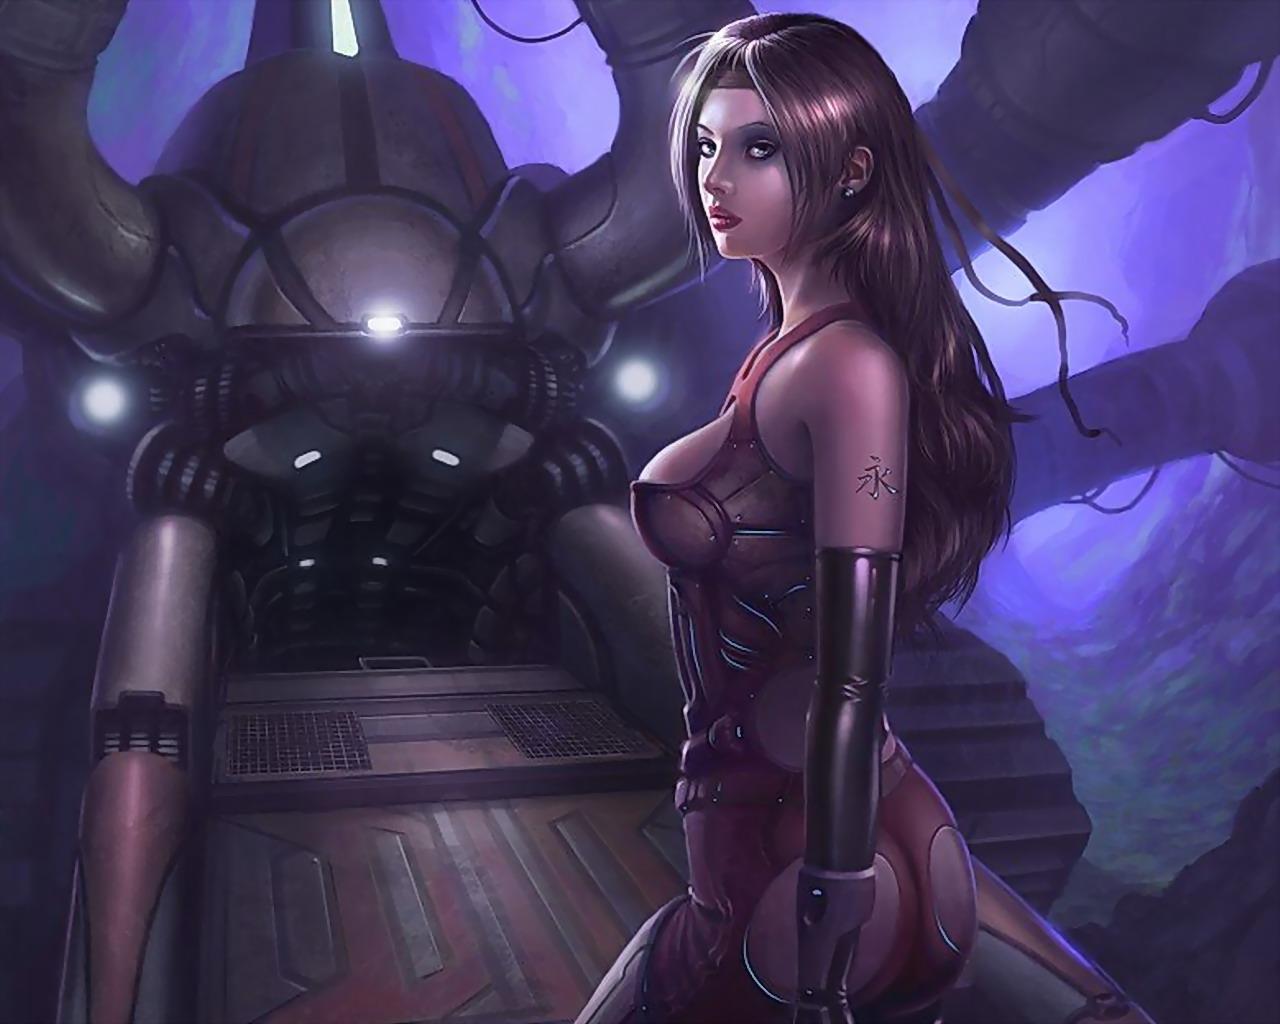 Porn sci fi fantasy wallpapers porn sexygirls